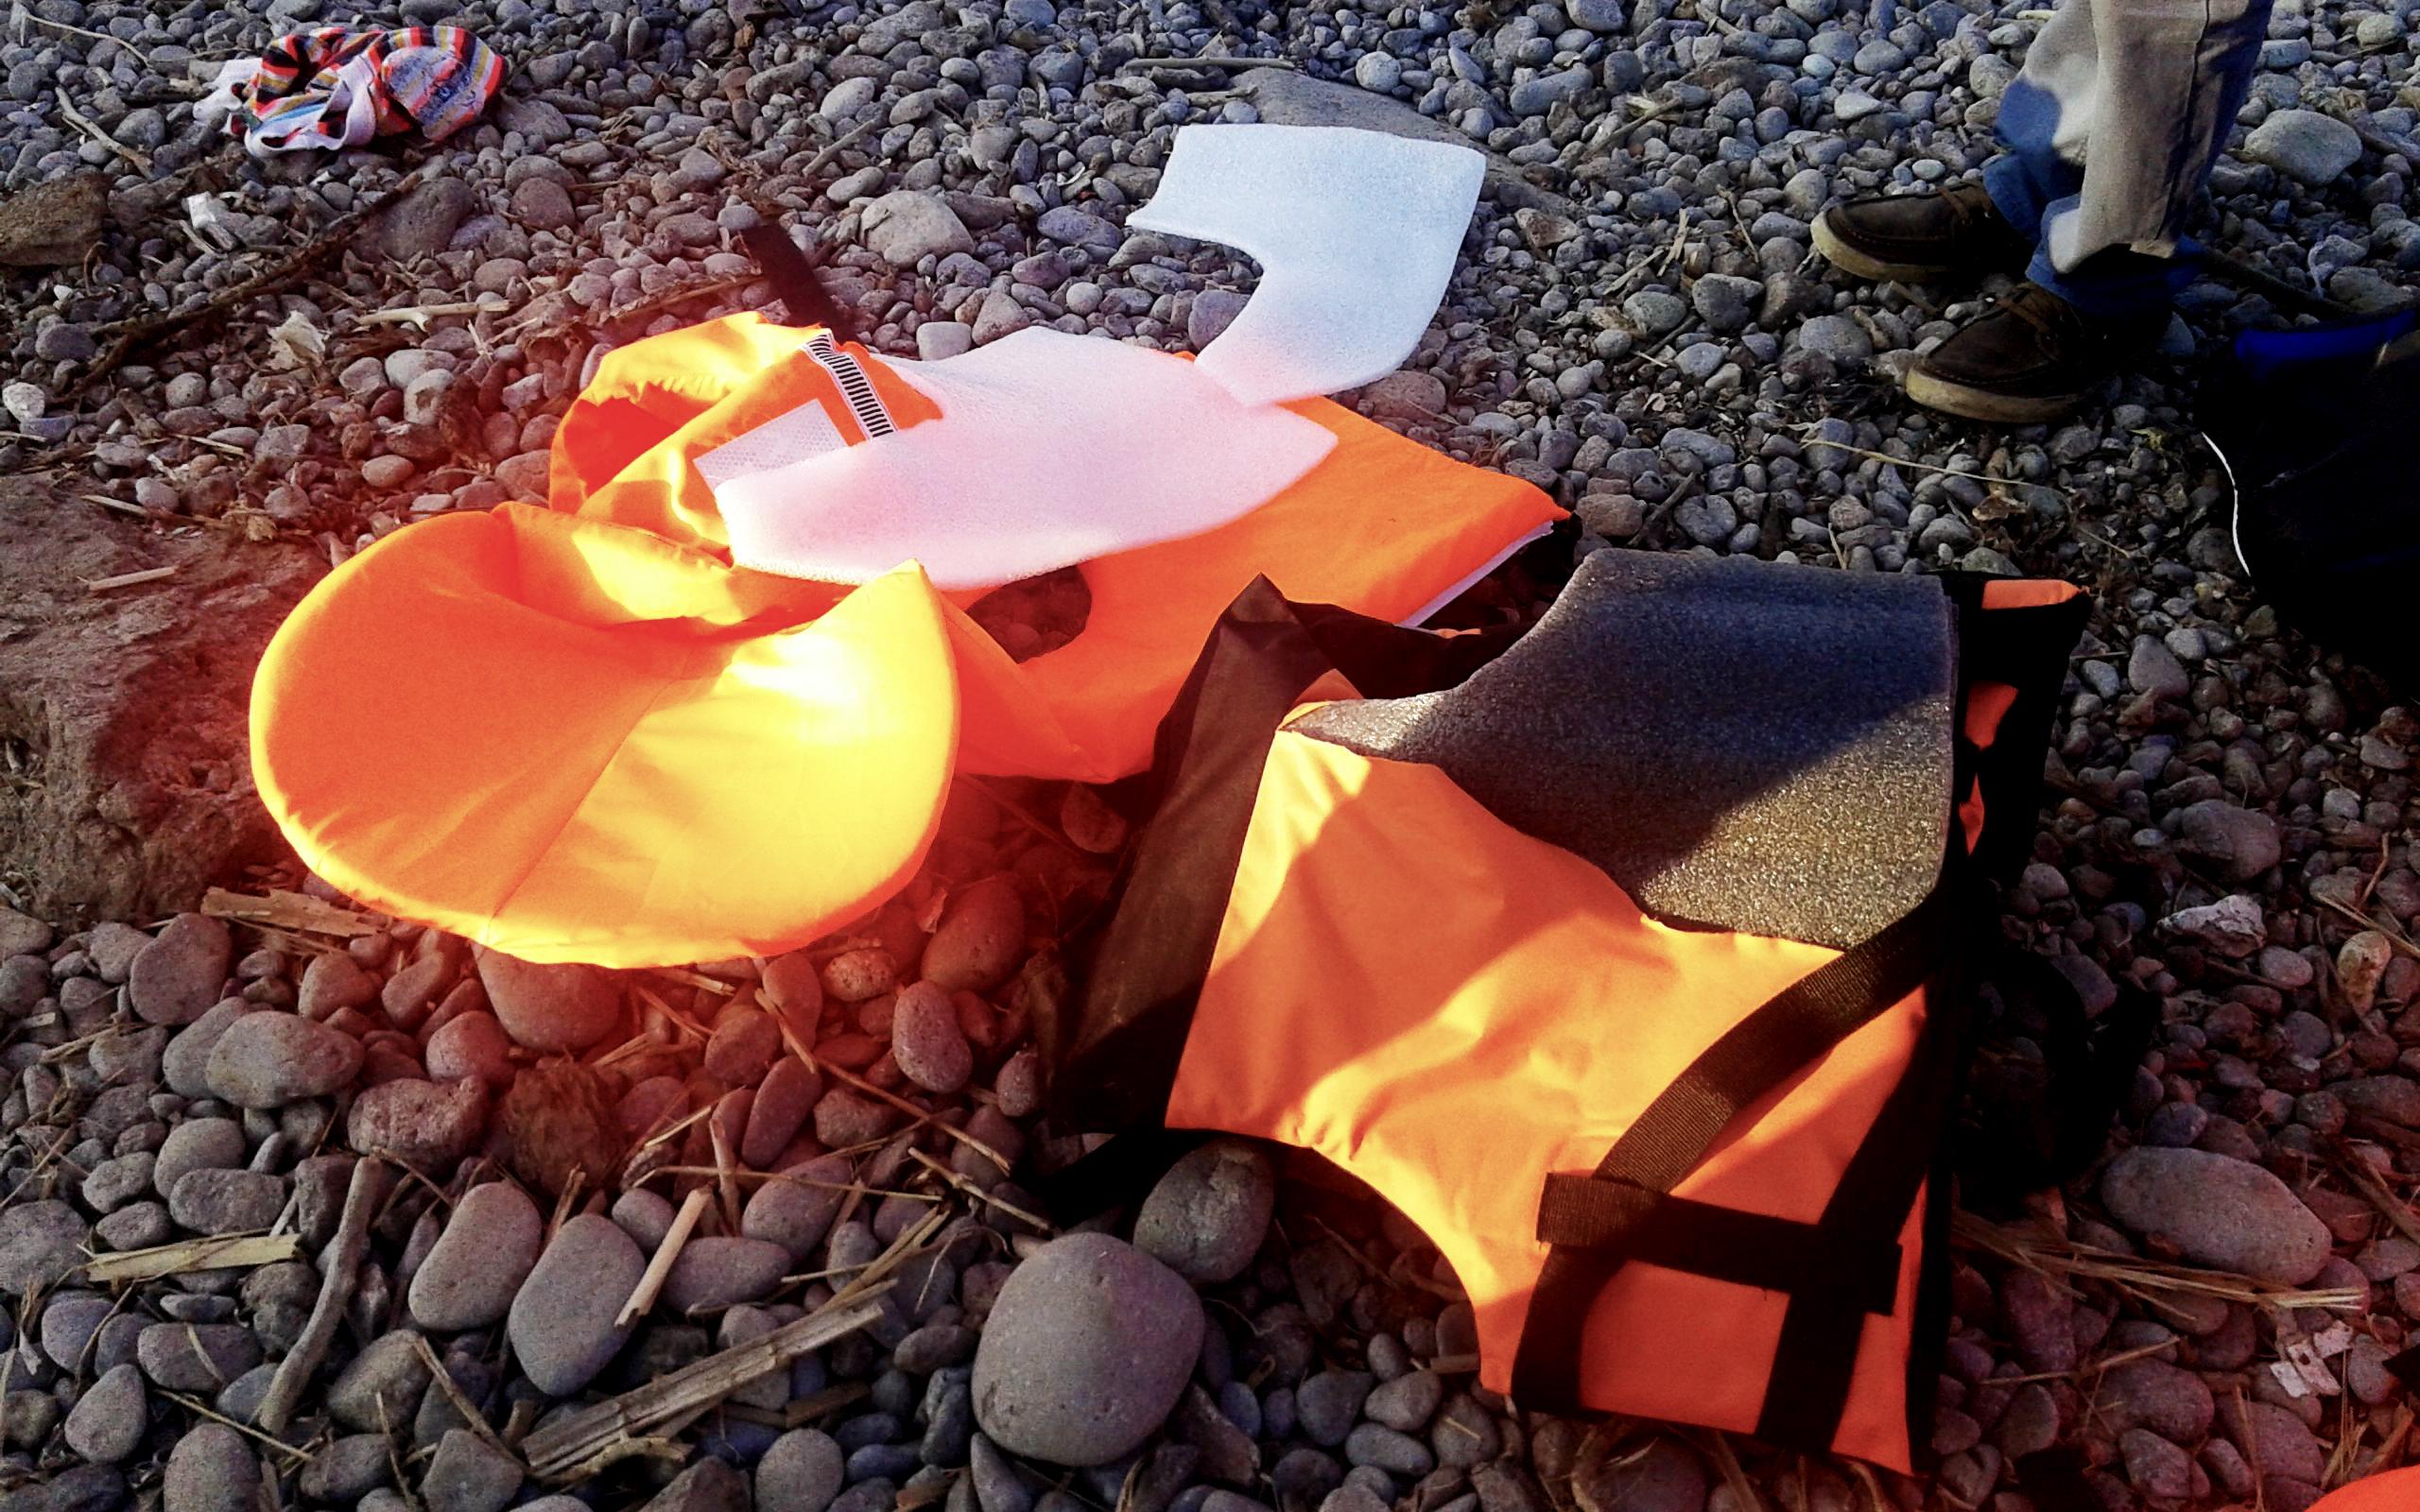 fake-life-vests-soak-up-chances-of-survival-for-shipwrecked-refugees5